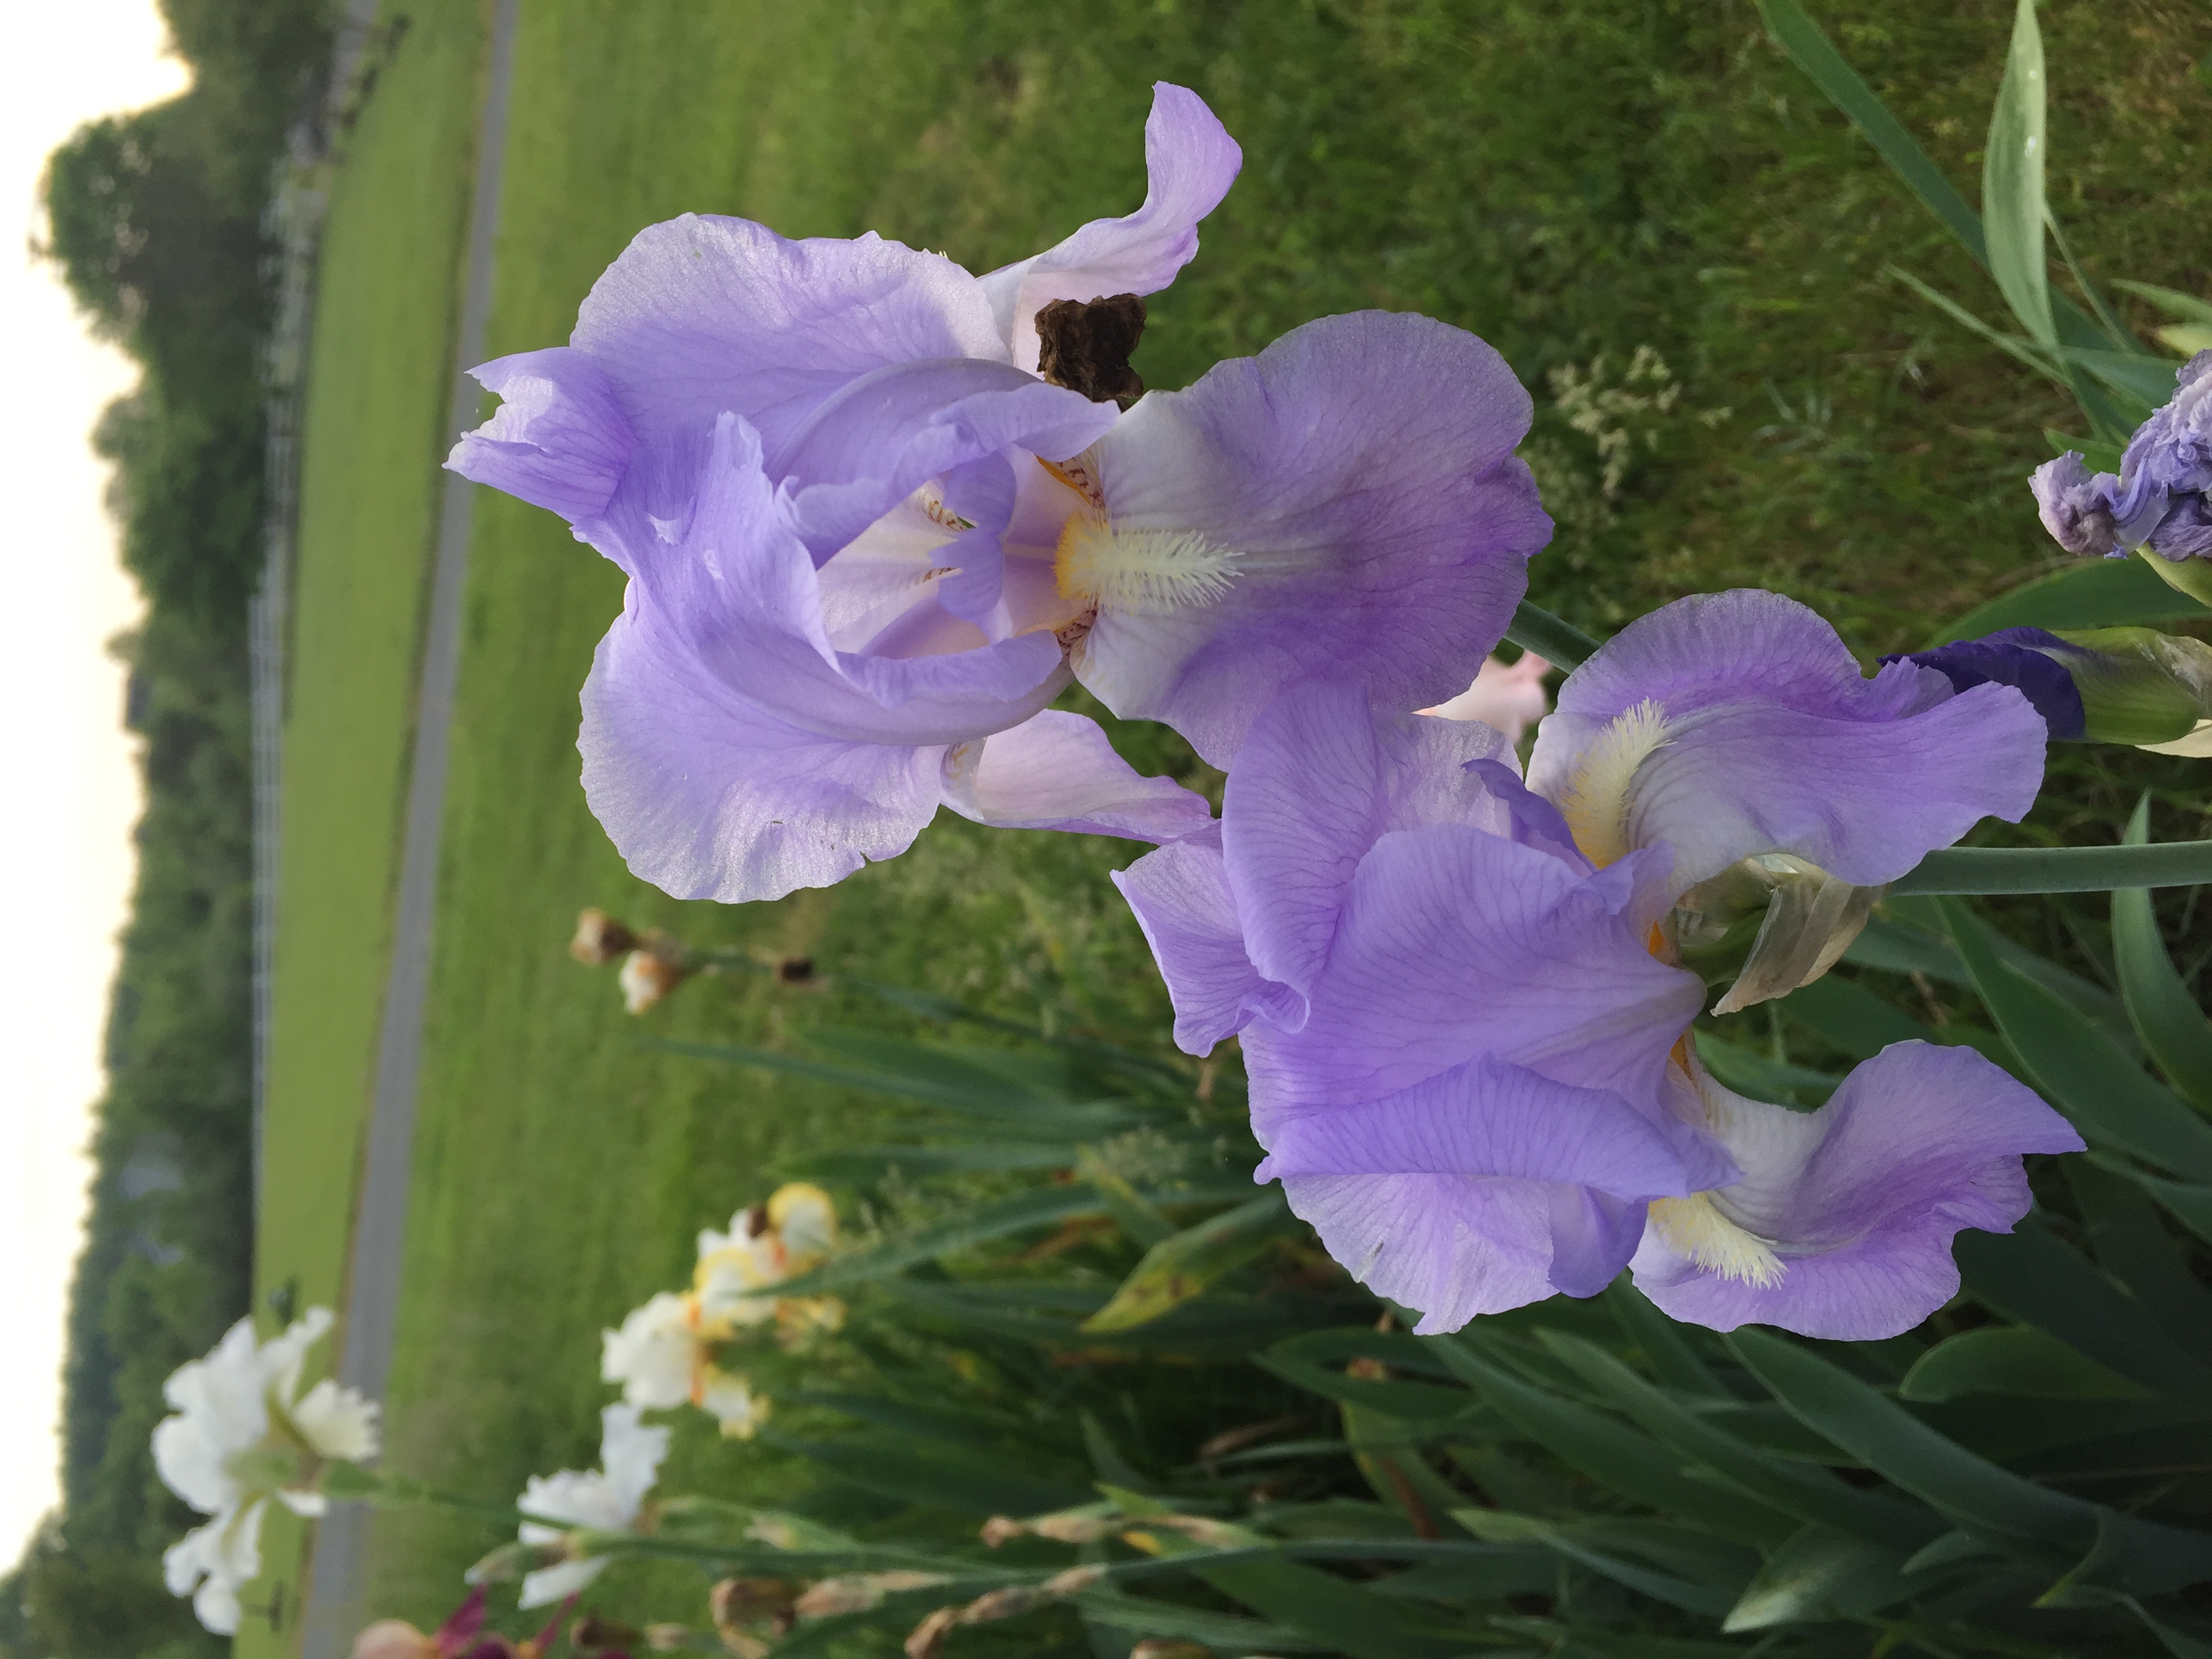 912BA993 3E79 4BF3 BCF2 55B9D3A975DC Irises, Roses, and Azaleas — Oh My!